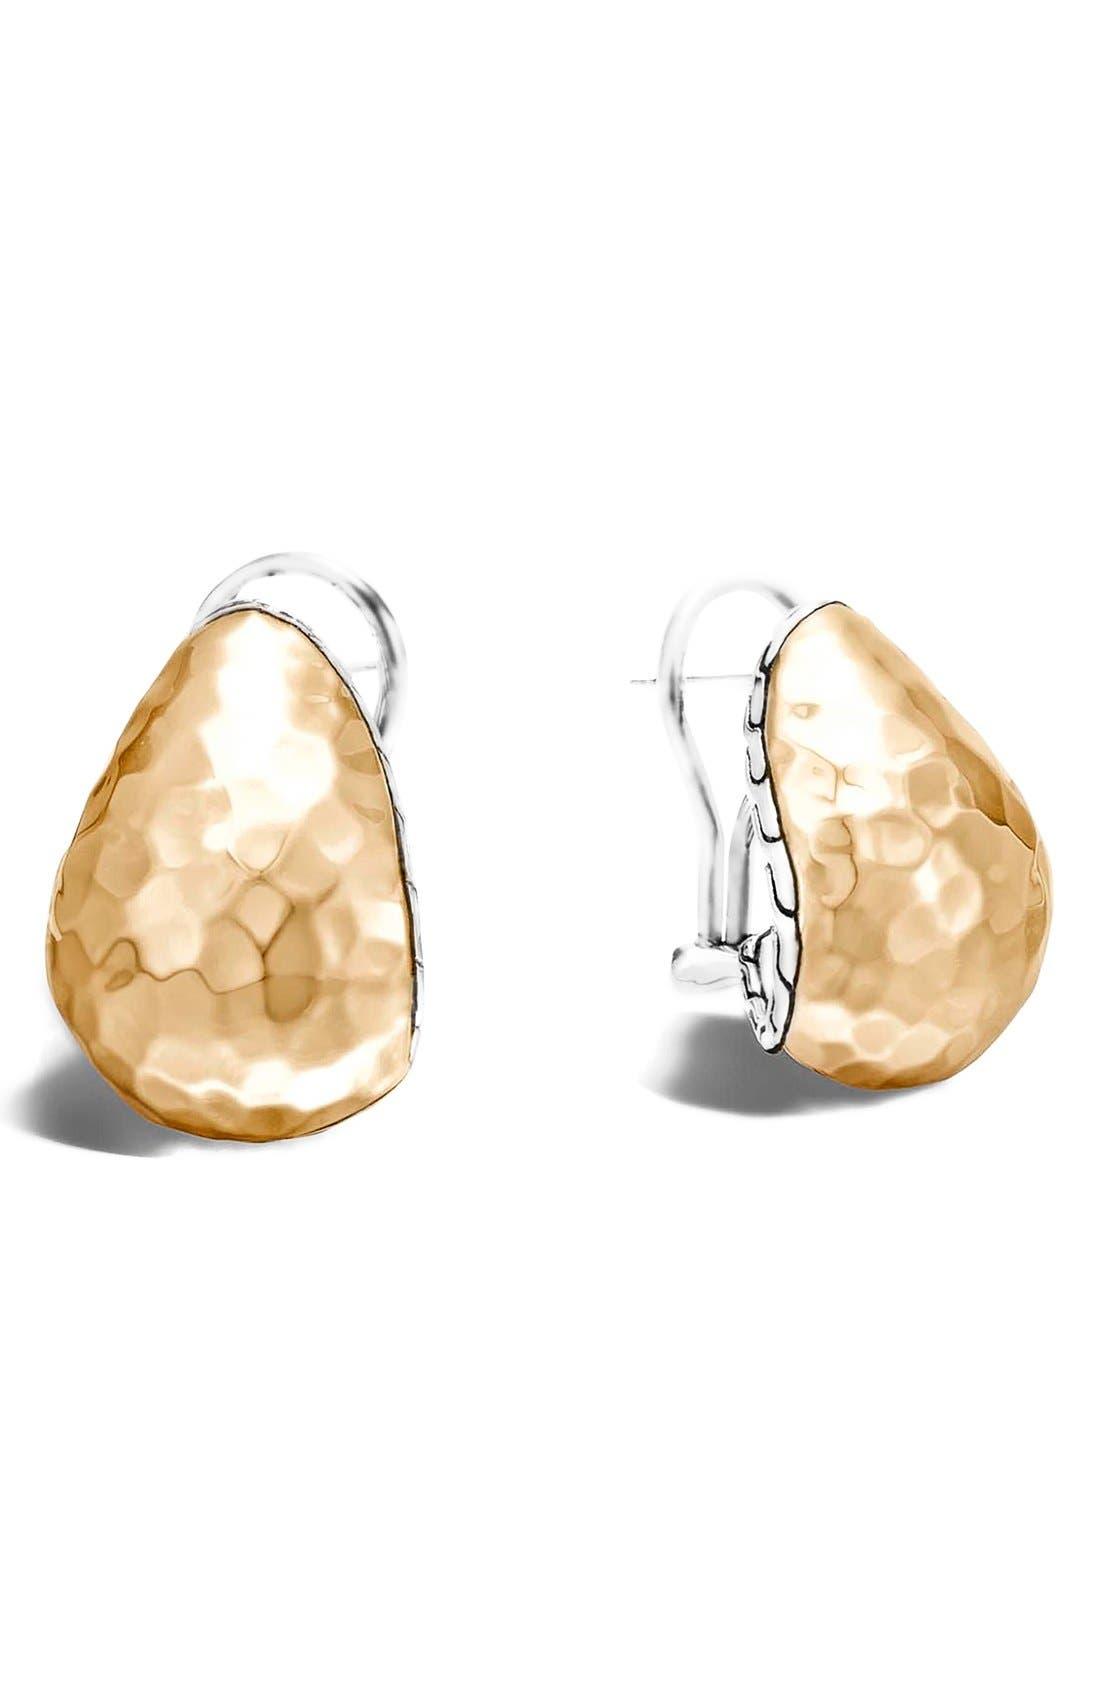 JOHN HARDY Classic Chain - Buddha Belly Stud Earrings